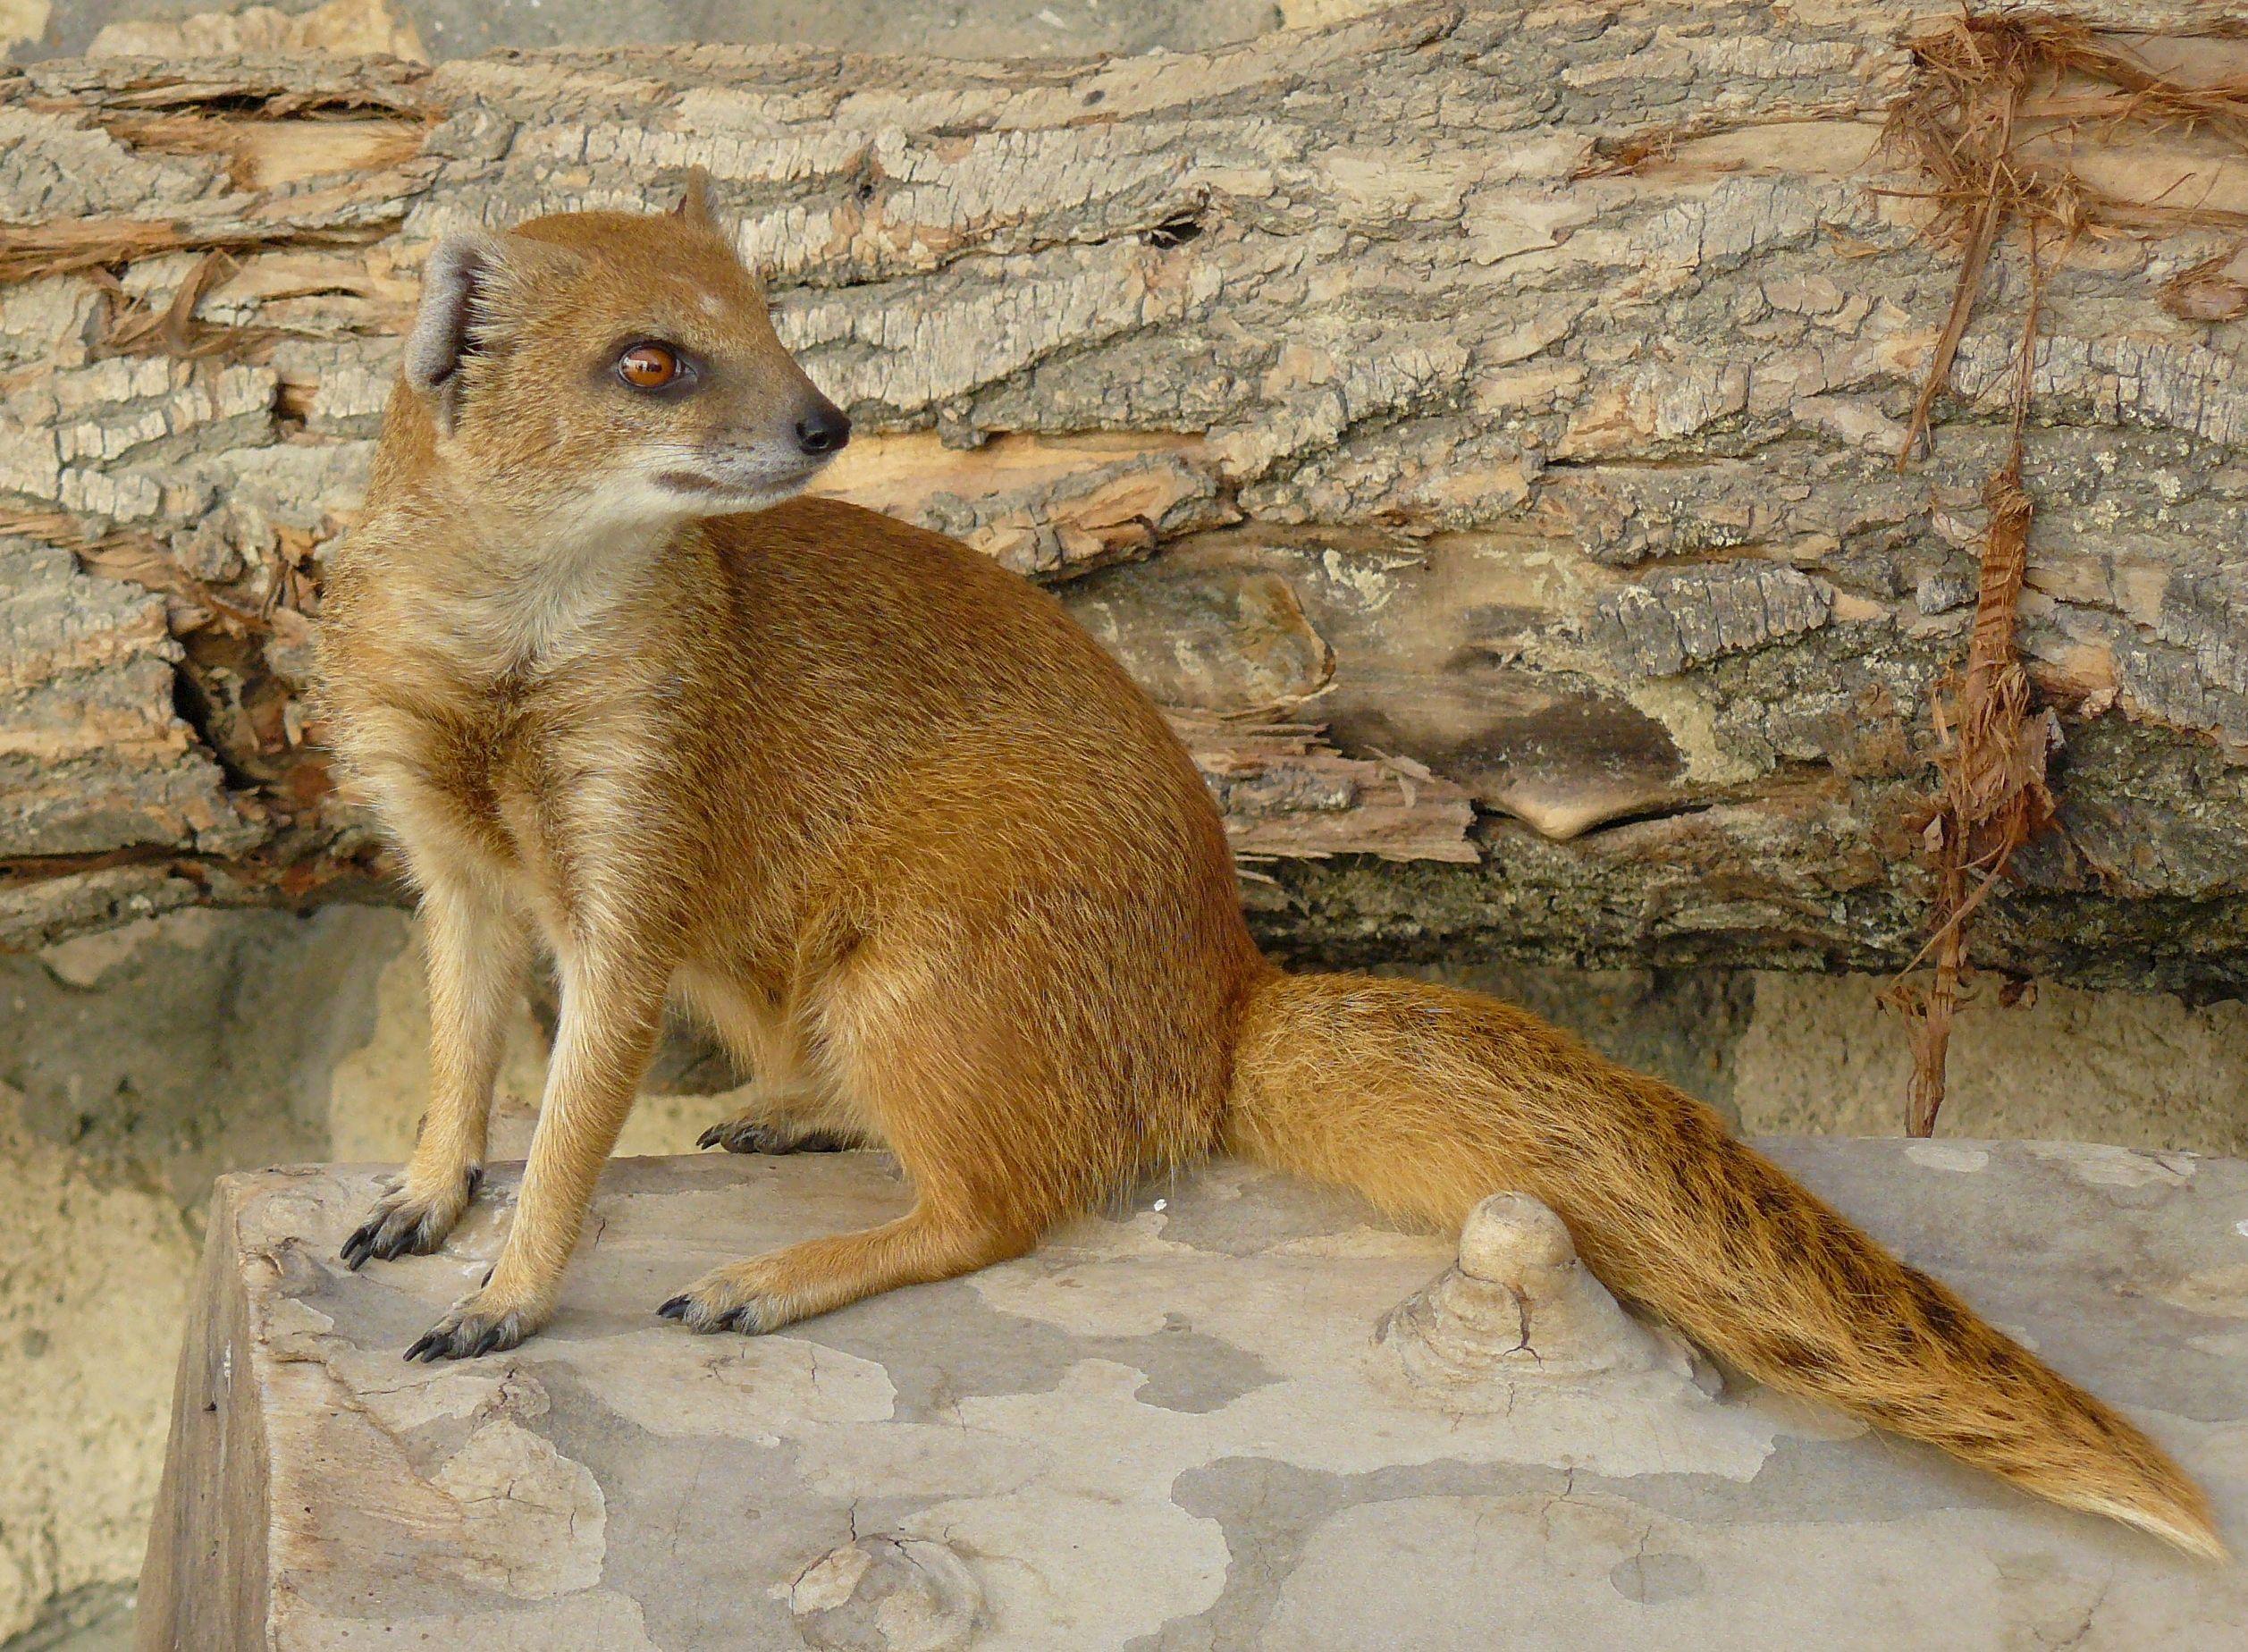 Yellow Mongoose Google Search Cute Animal Clipart Cute Animals Cute Animal Photos